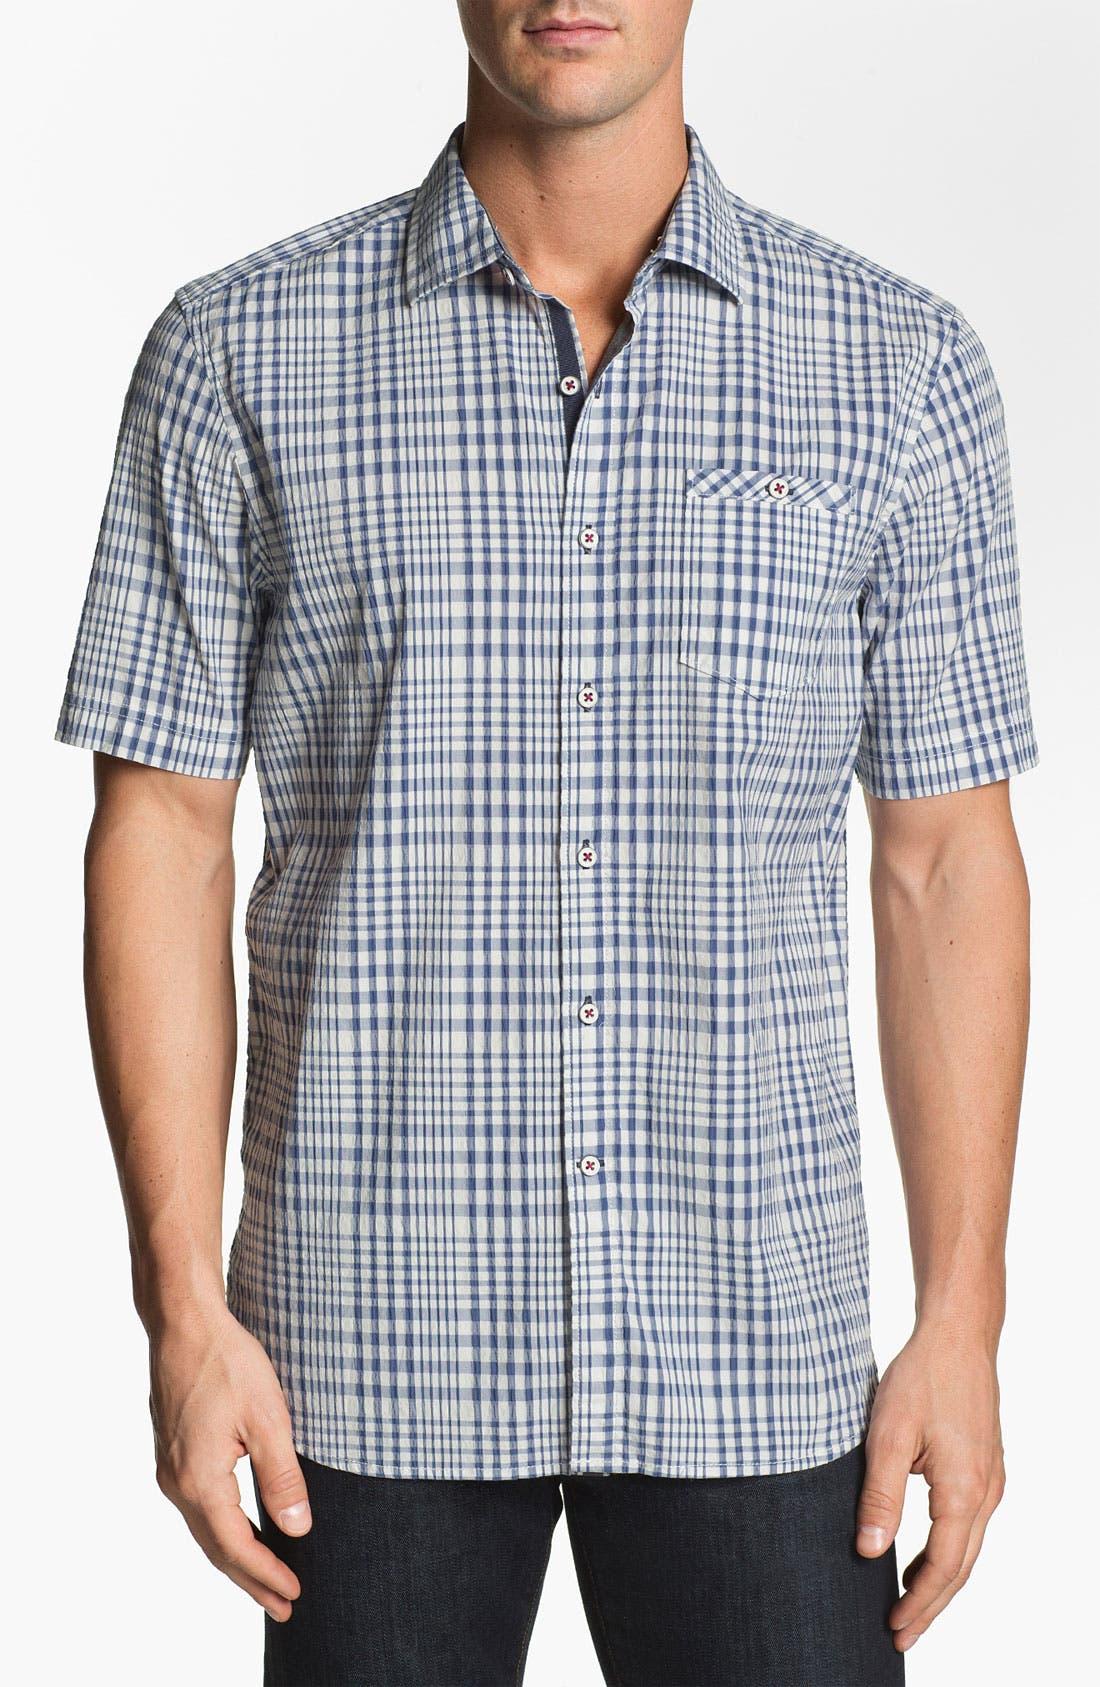 Alternate Image 1 Selected - Tommy Bahama Denim 'Paradise Heights' Short Sleeve Sport Shirt